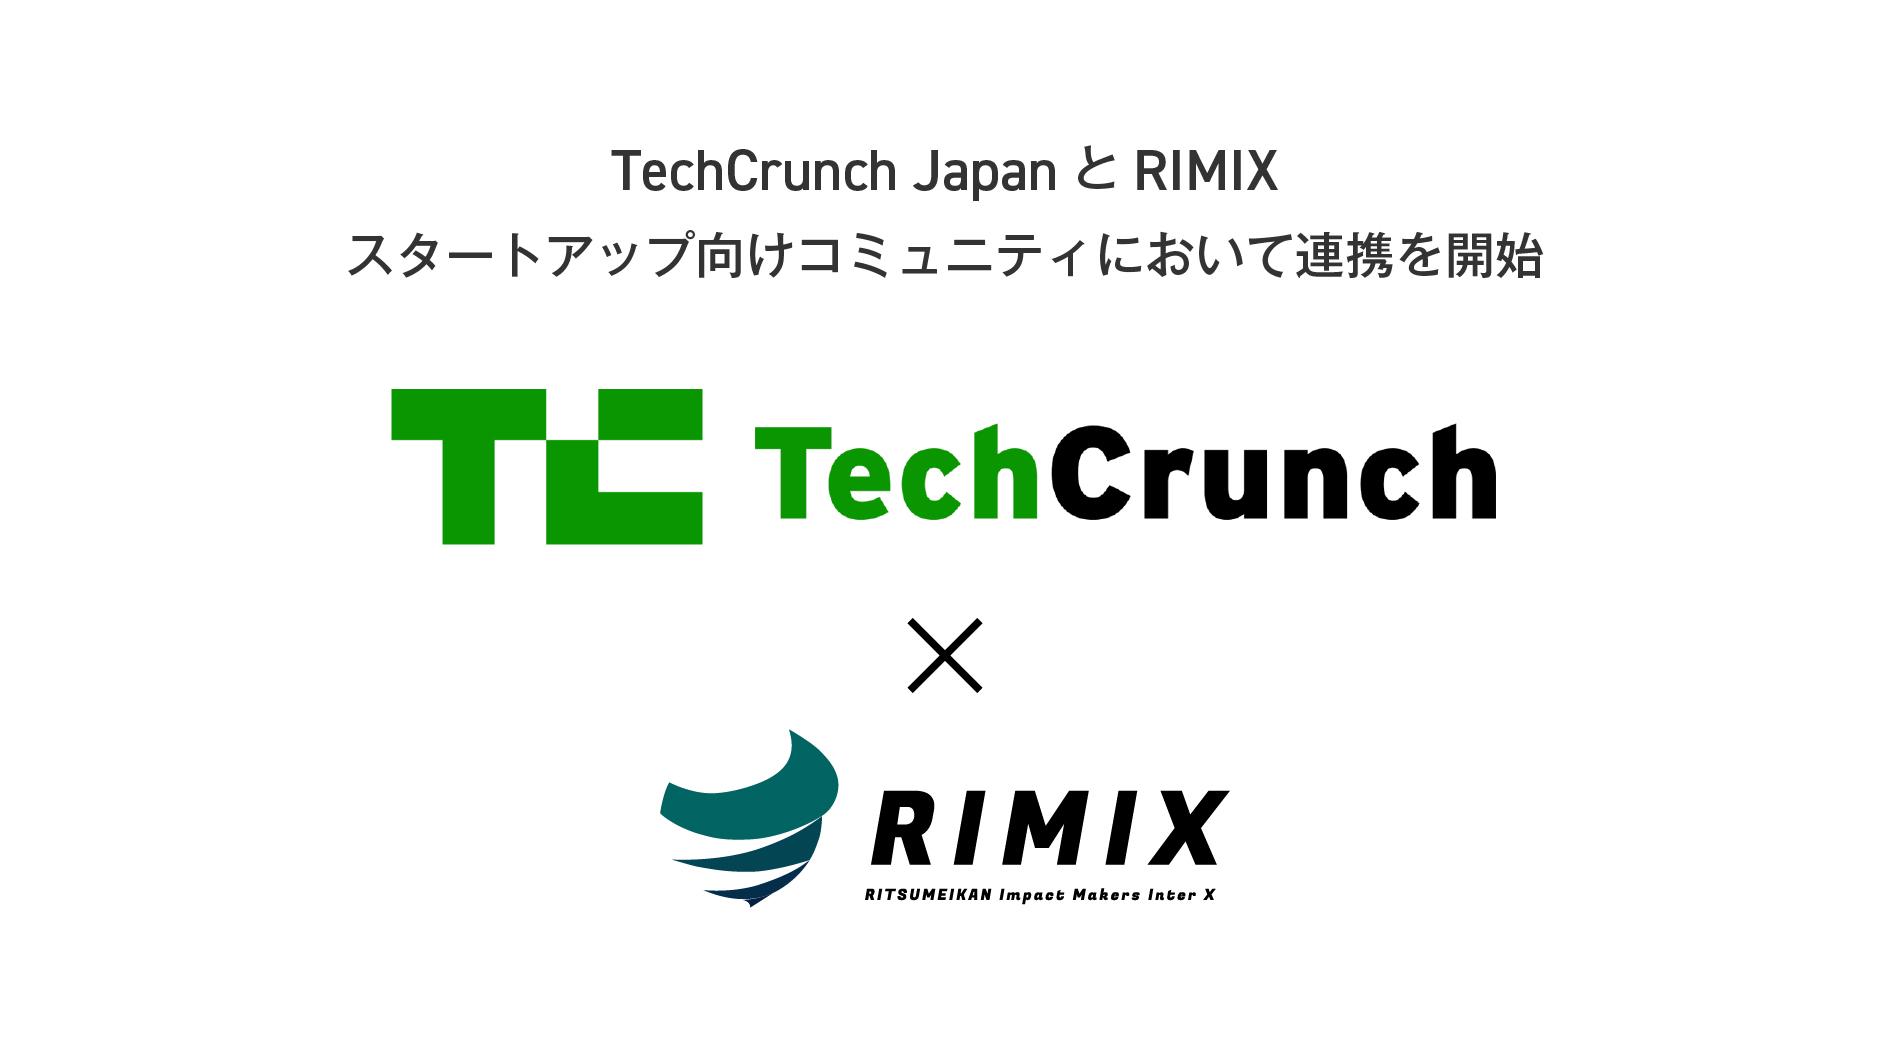 TechCrunch JapanとRIMIXが、スタートアップ向けコミュニティにおいて連携を開始しました